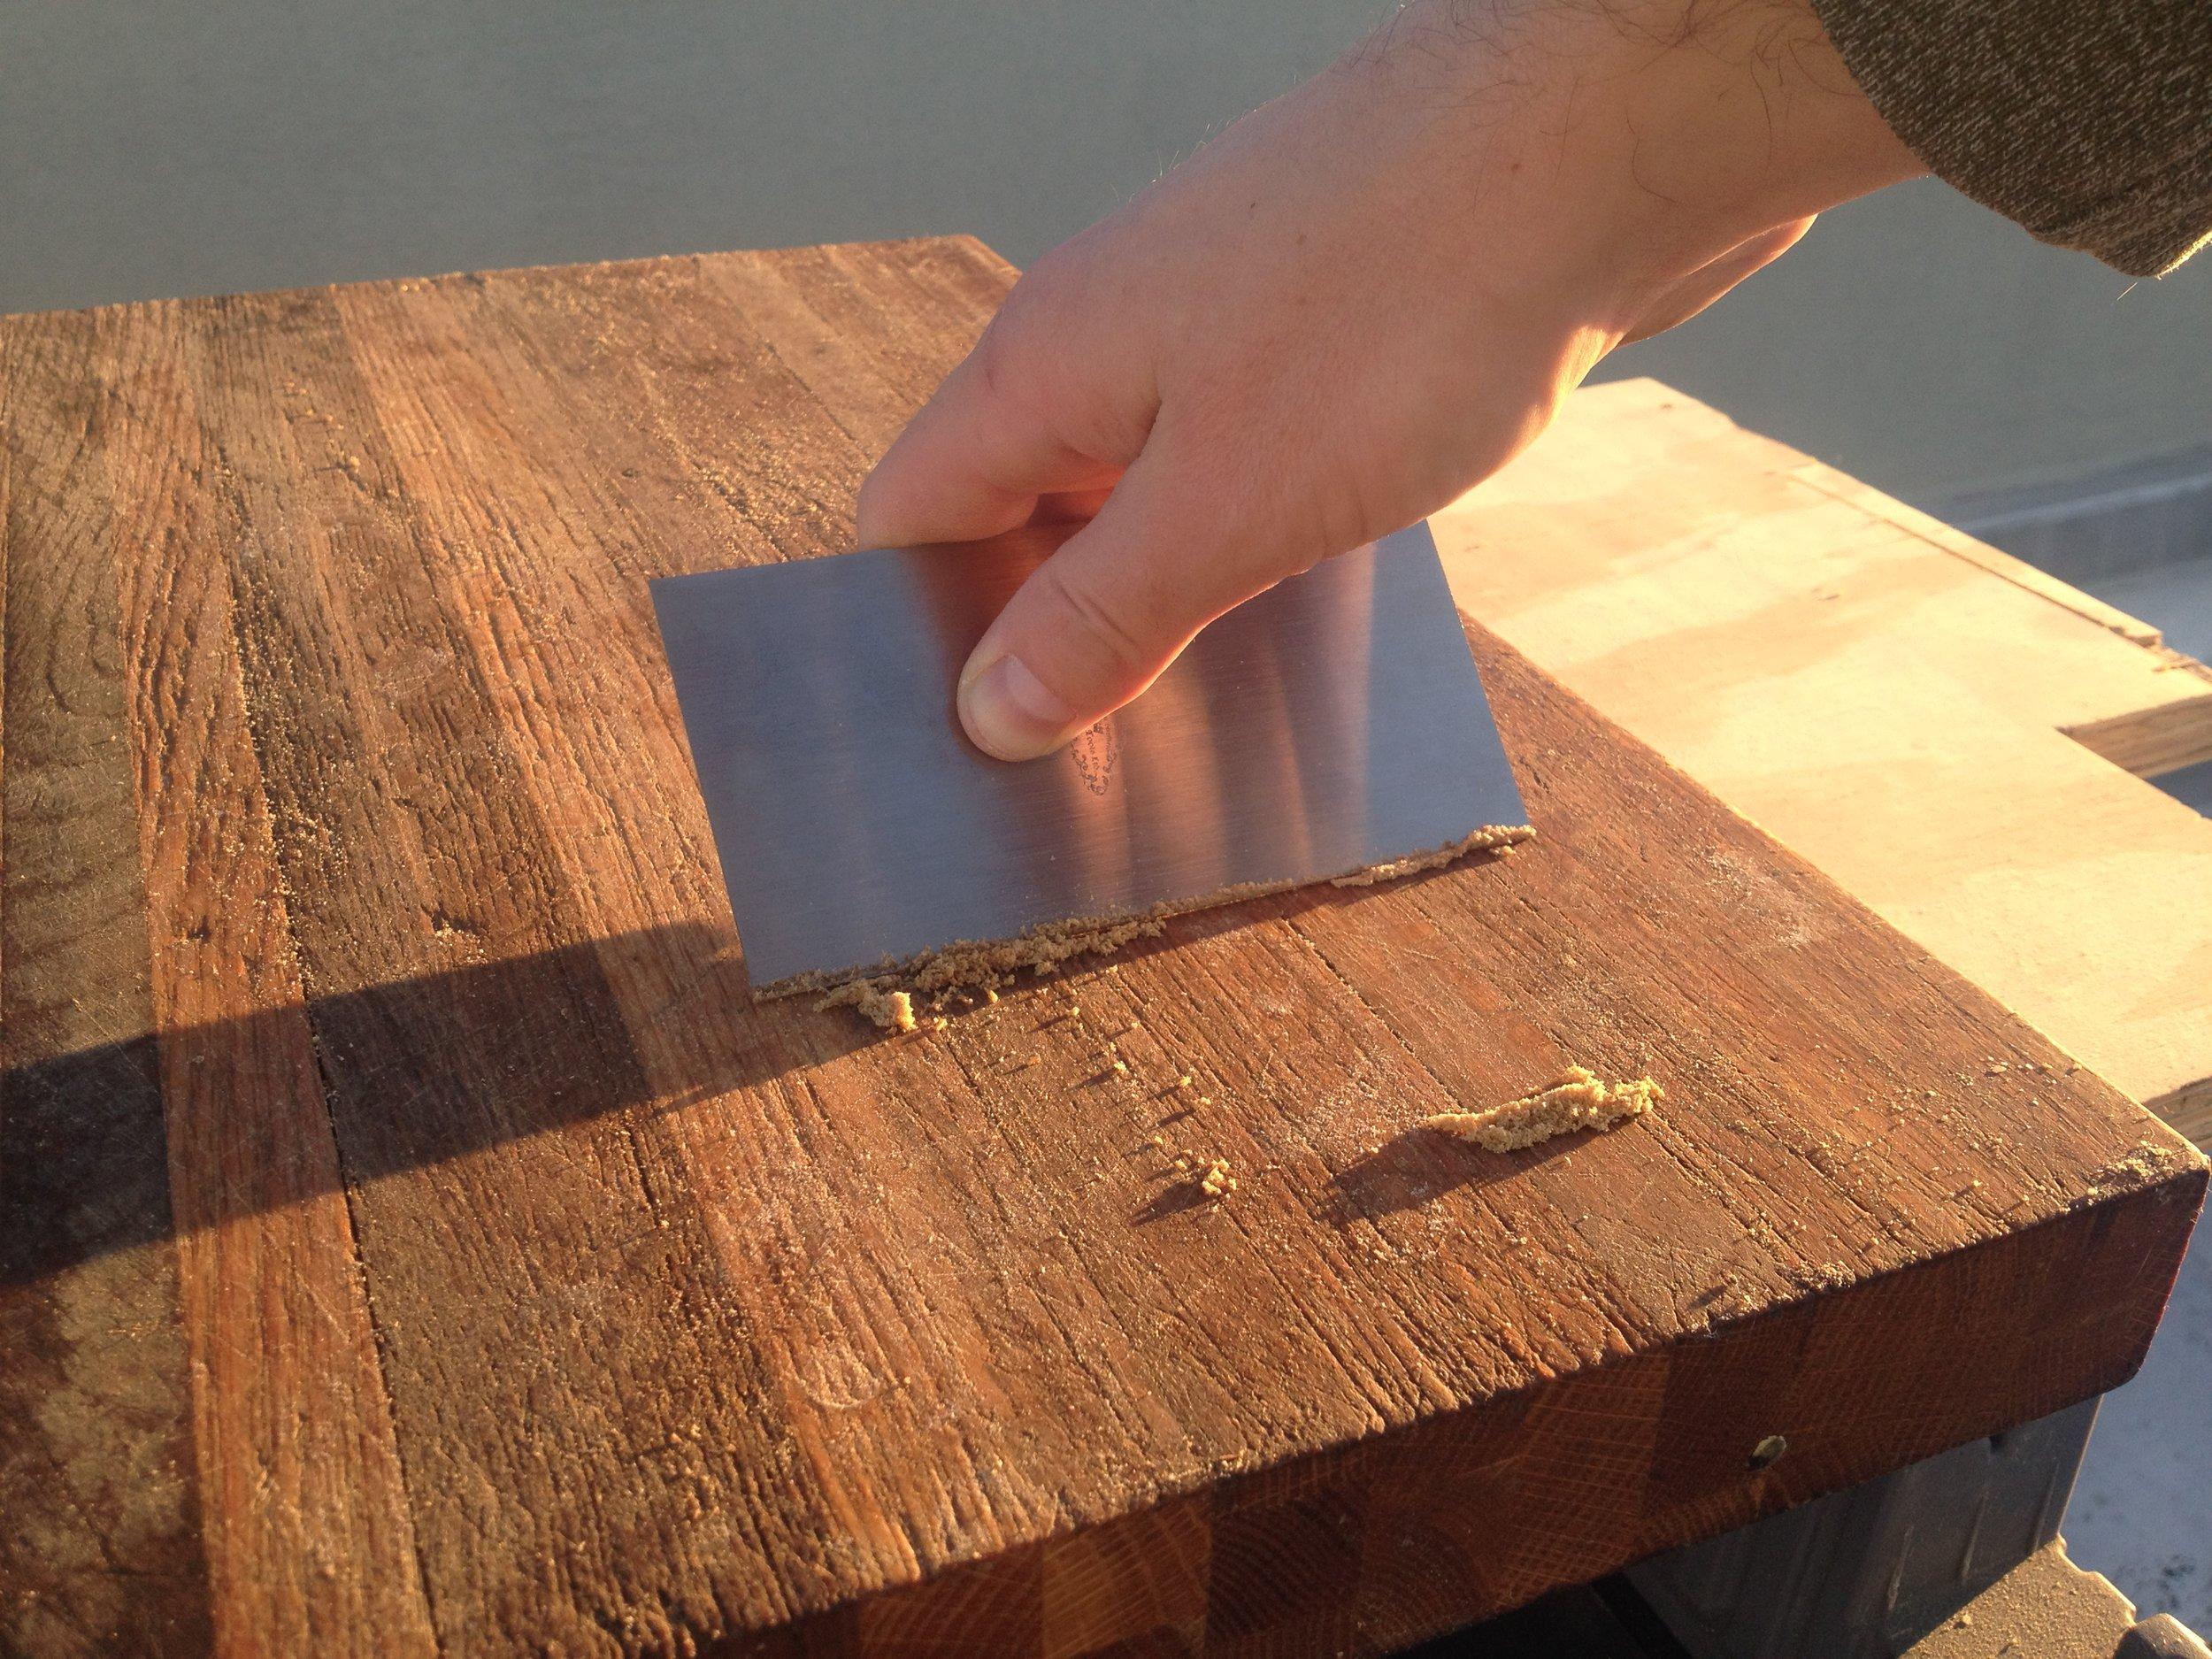 cutting-board-restoration-in-progress-2.jpg